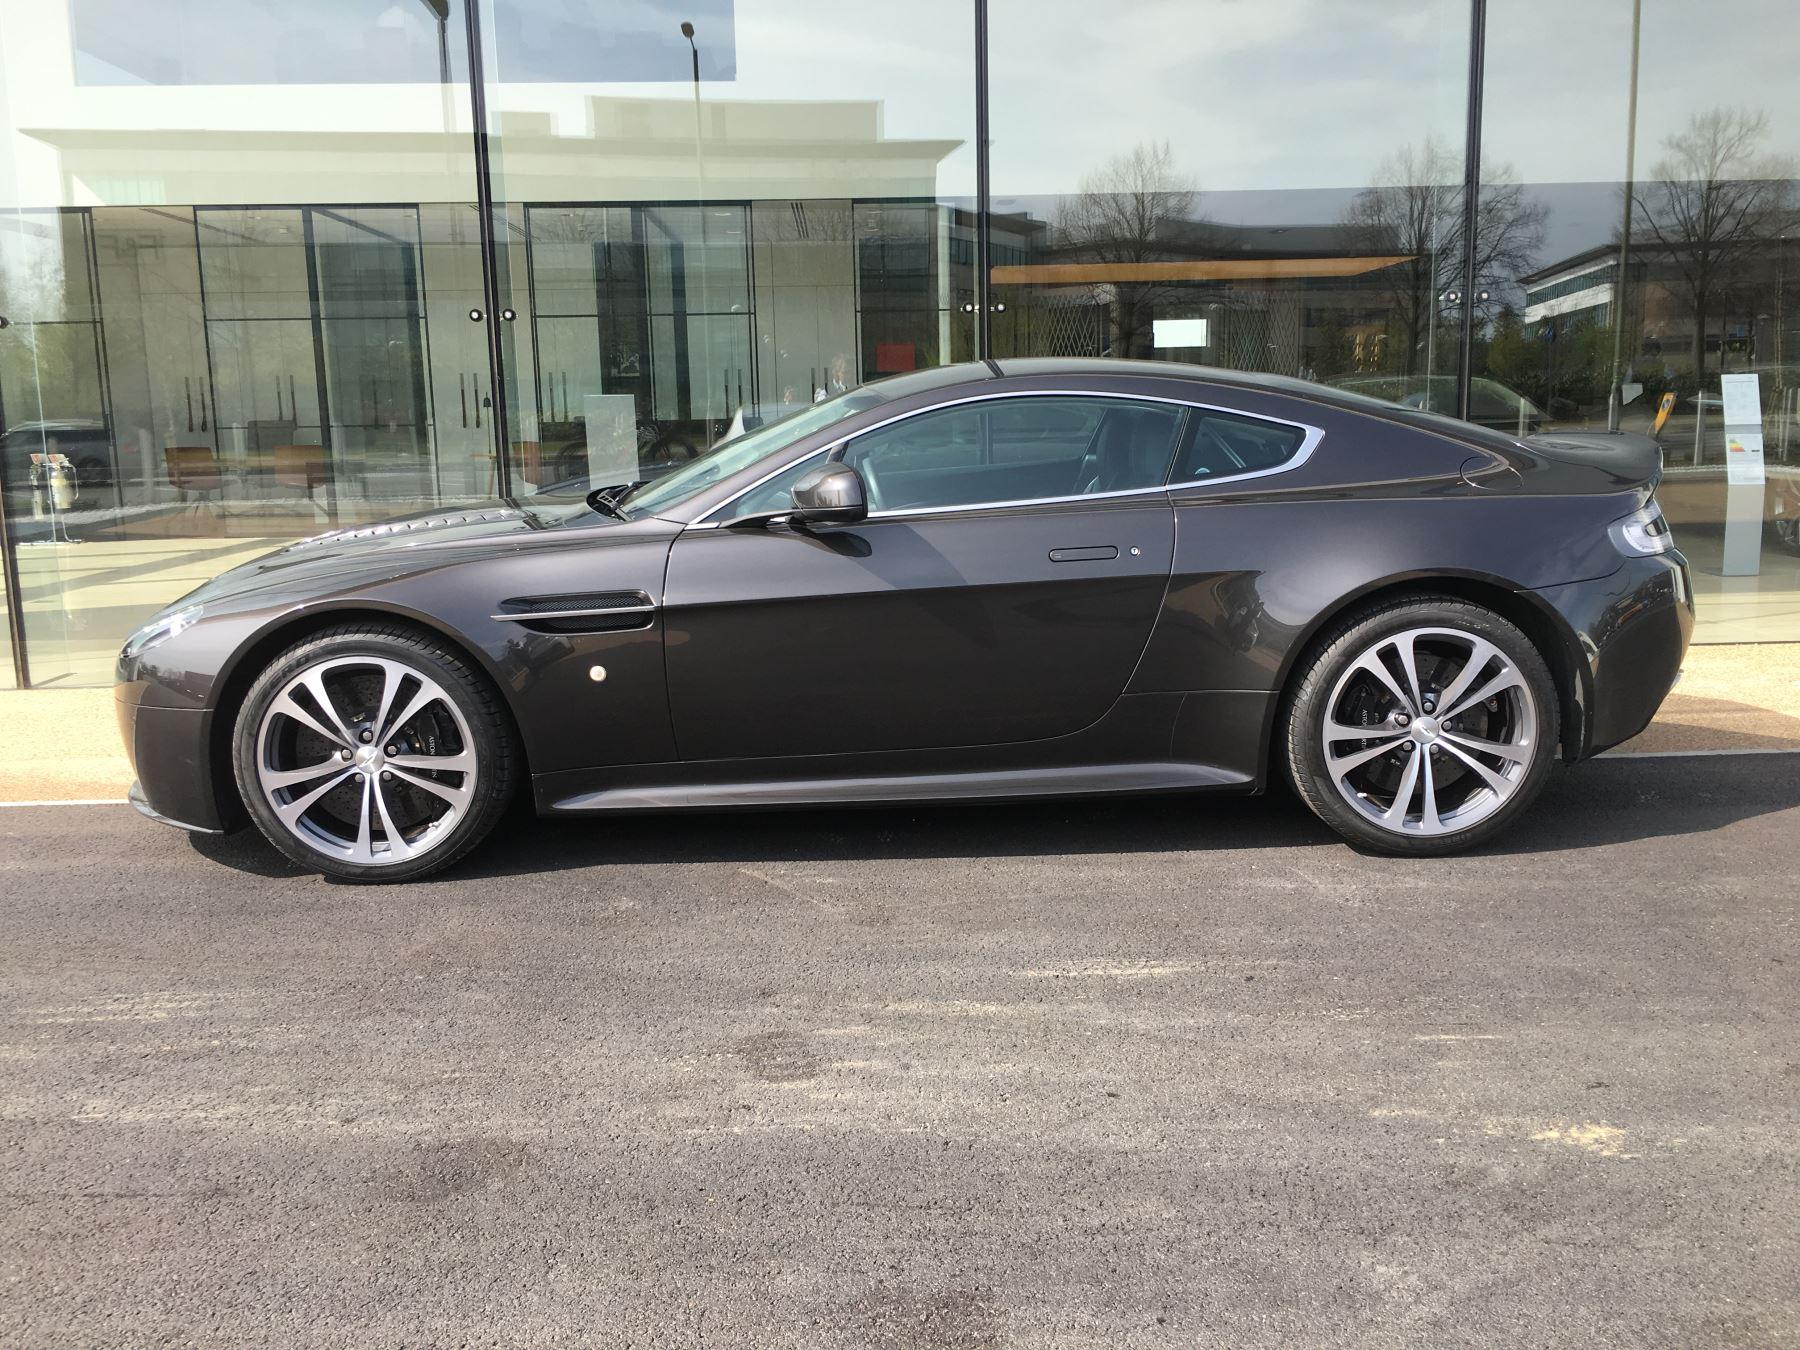 Aston Martin V12 Vantage 2dr image 1